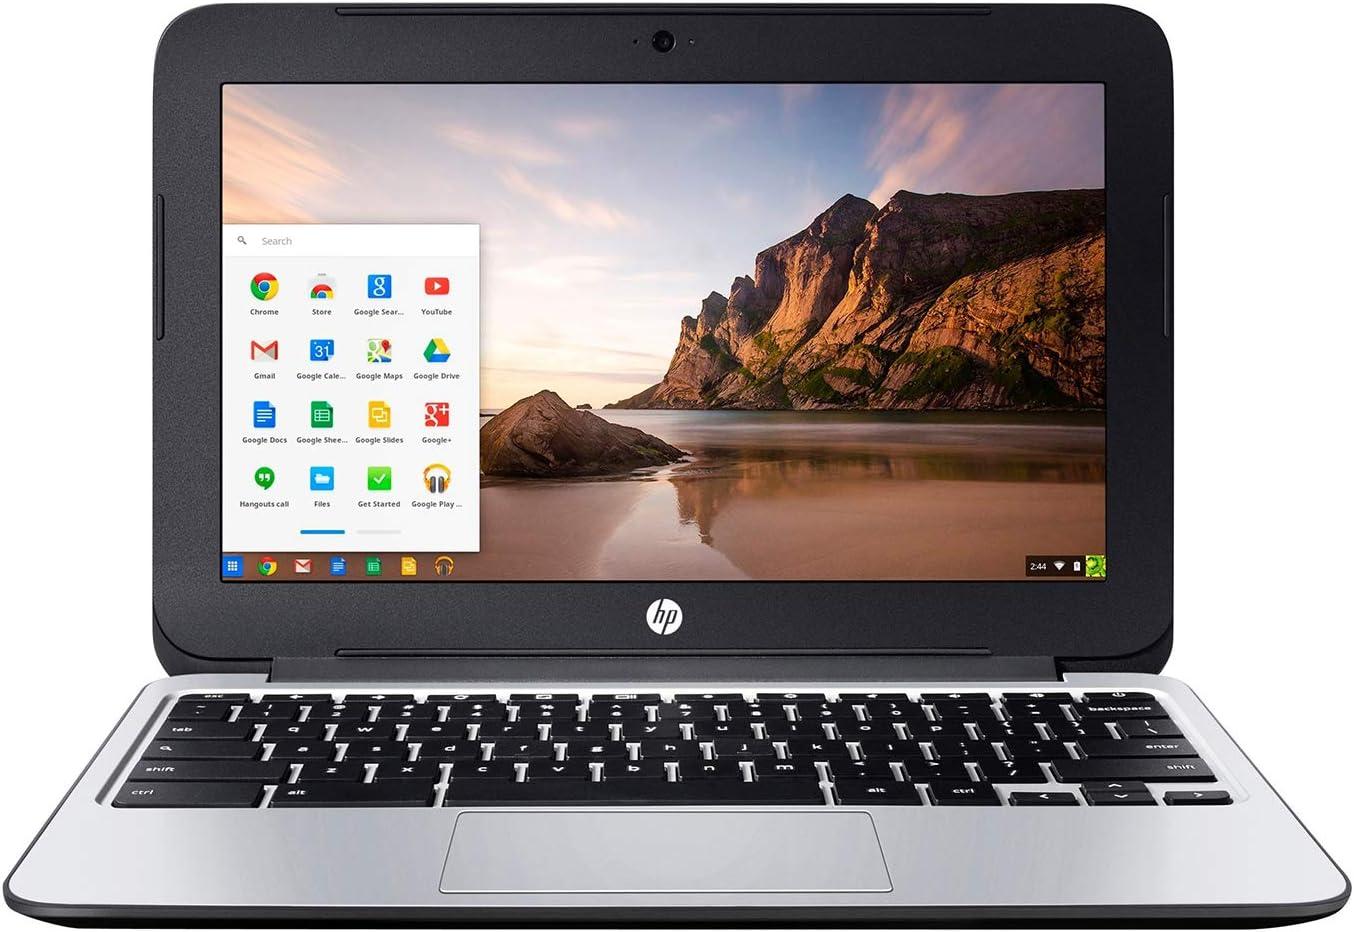 "HP L6V37AA#ABA Chromebook (Chrome OS, Intel Celeron N2840 2.16 GHz, 11.6"" LED-lit Screen, Storage: 16 GB, RAM: 4 GB) Black"